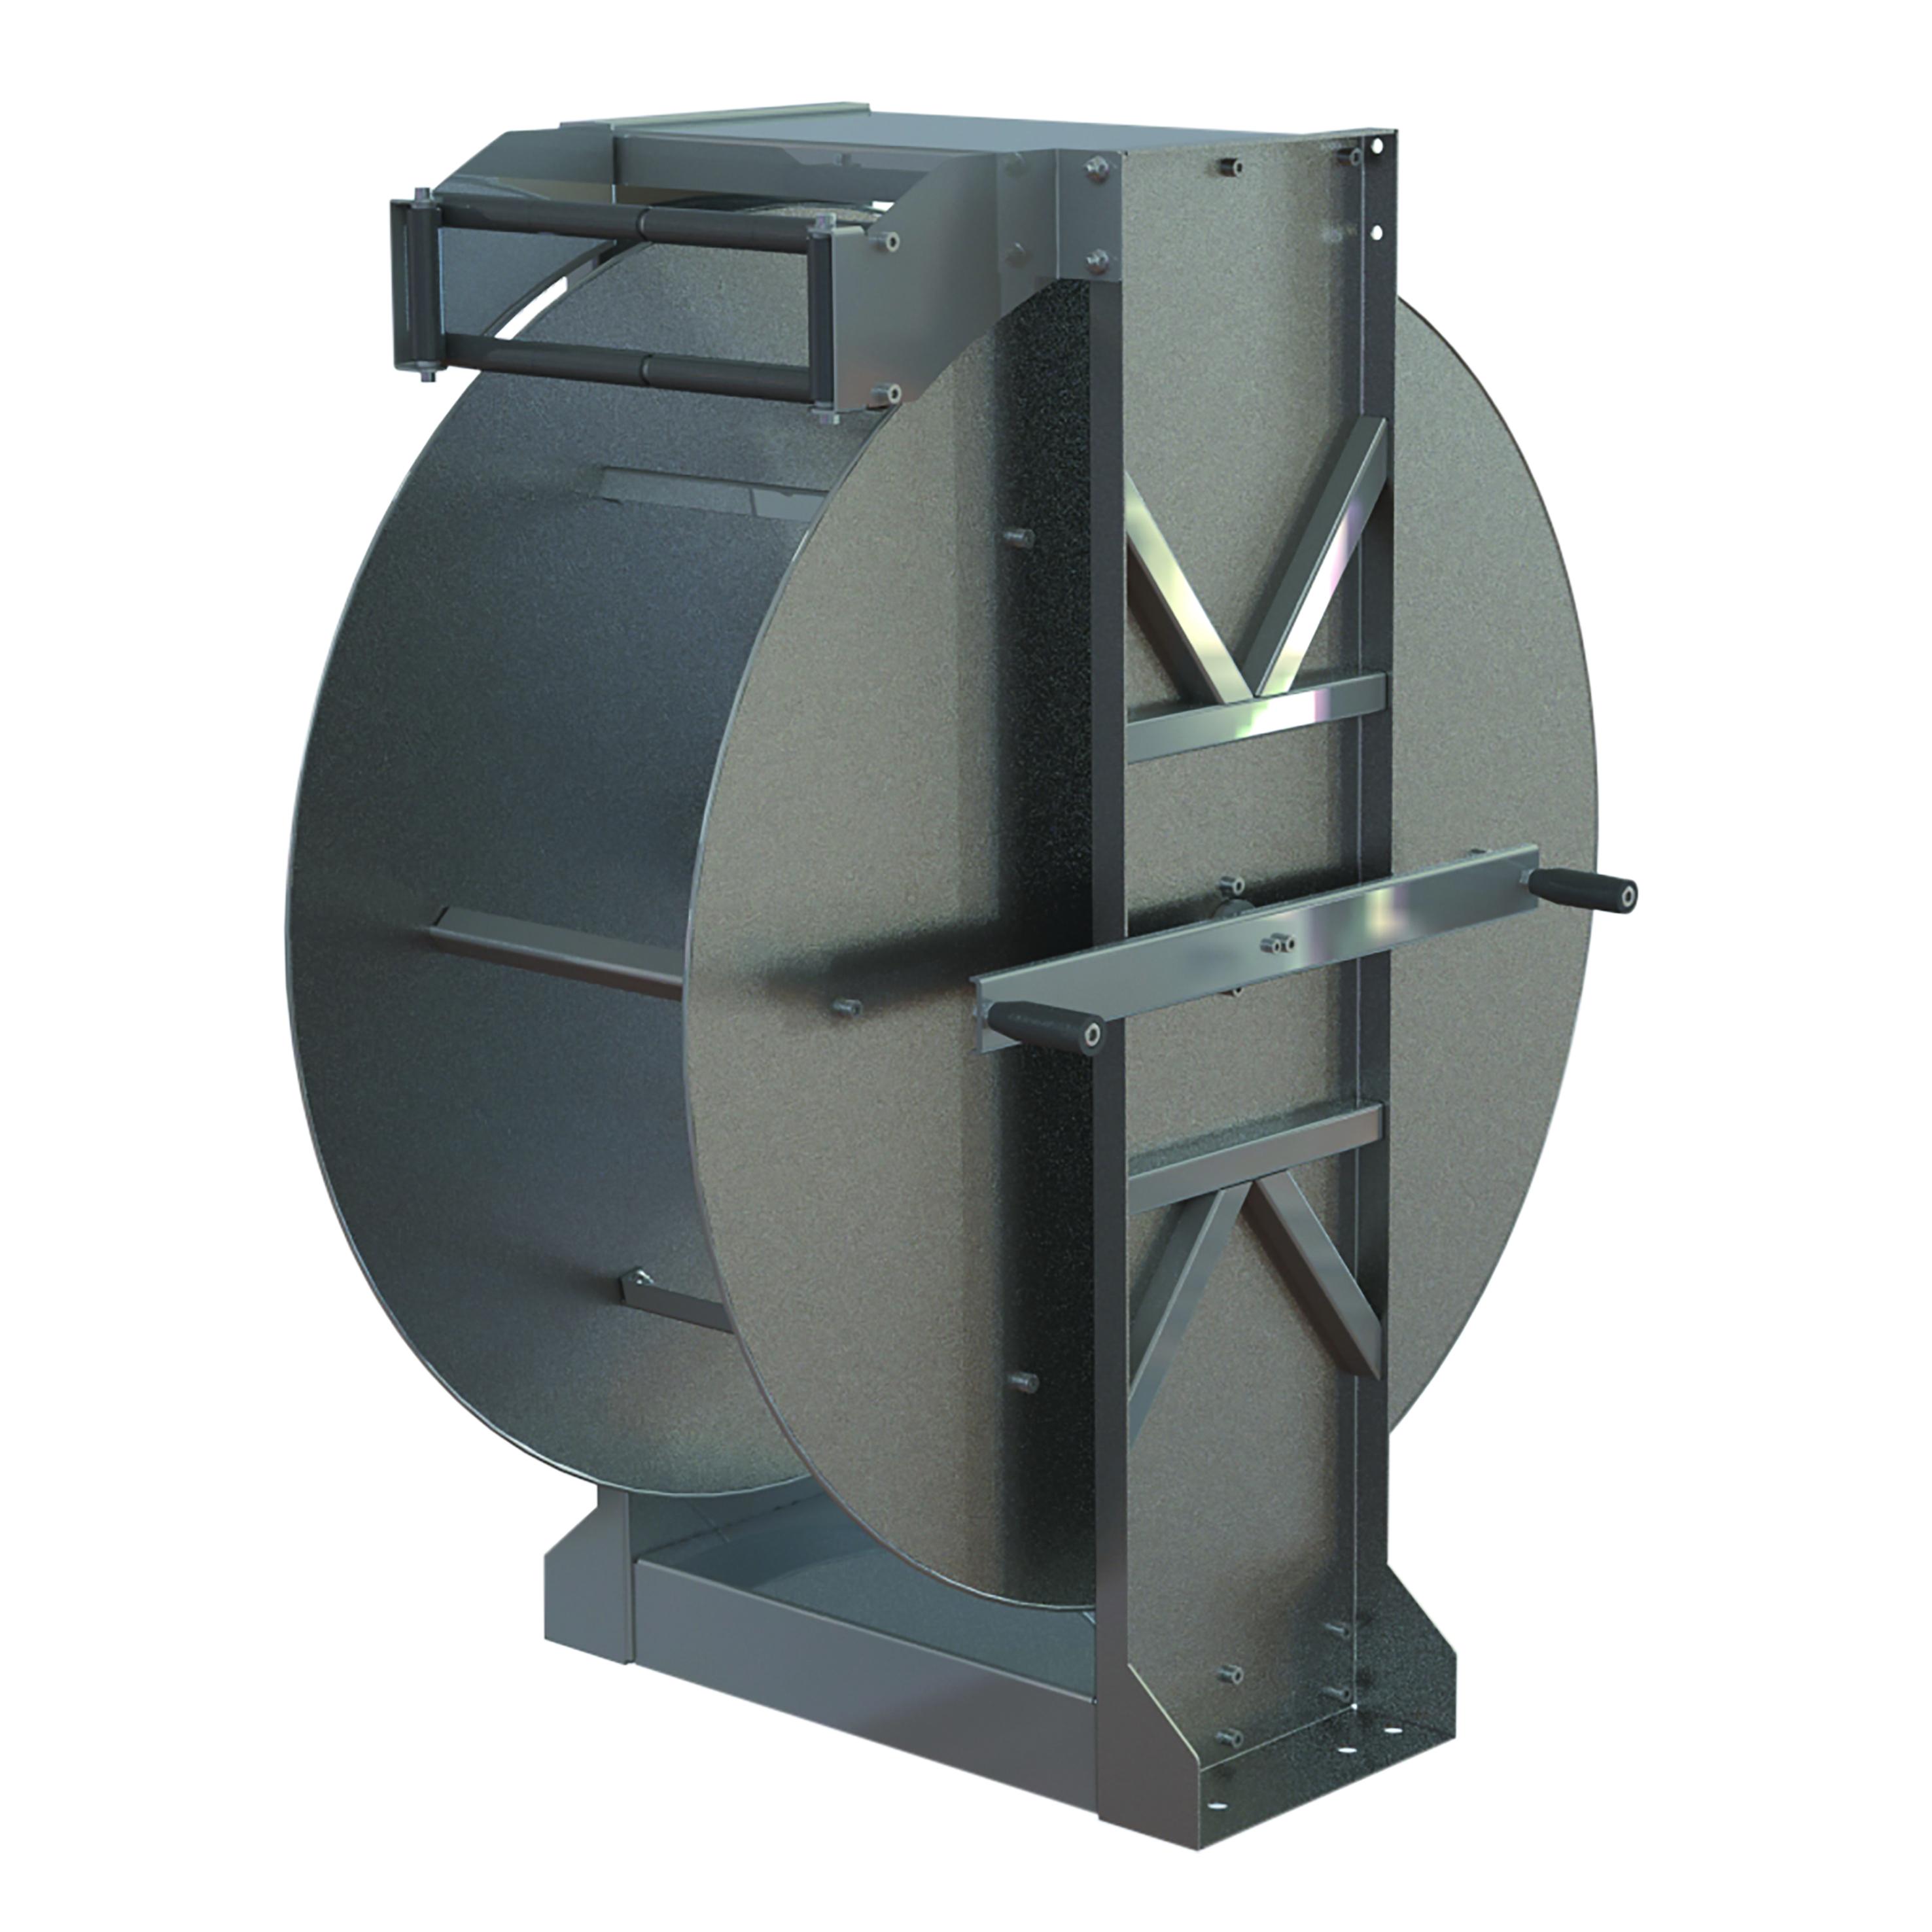 AVM2090 - Carretes de mangueras para agua - Alto flujo 0-100 BAR / 0-1450 PSI